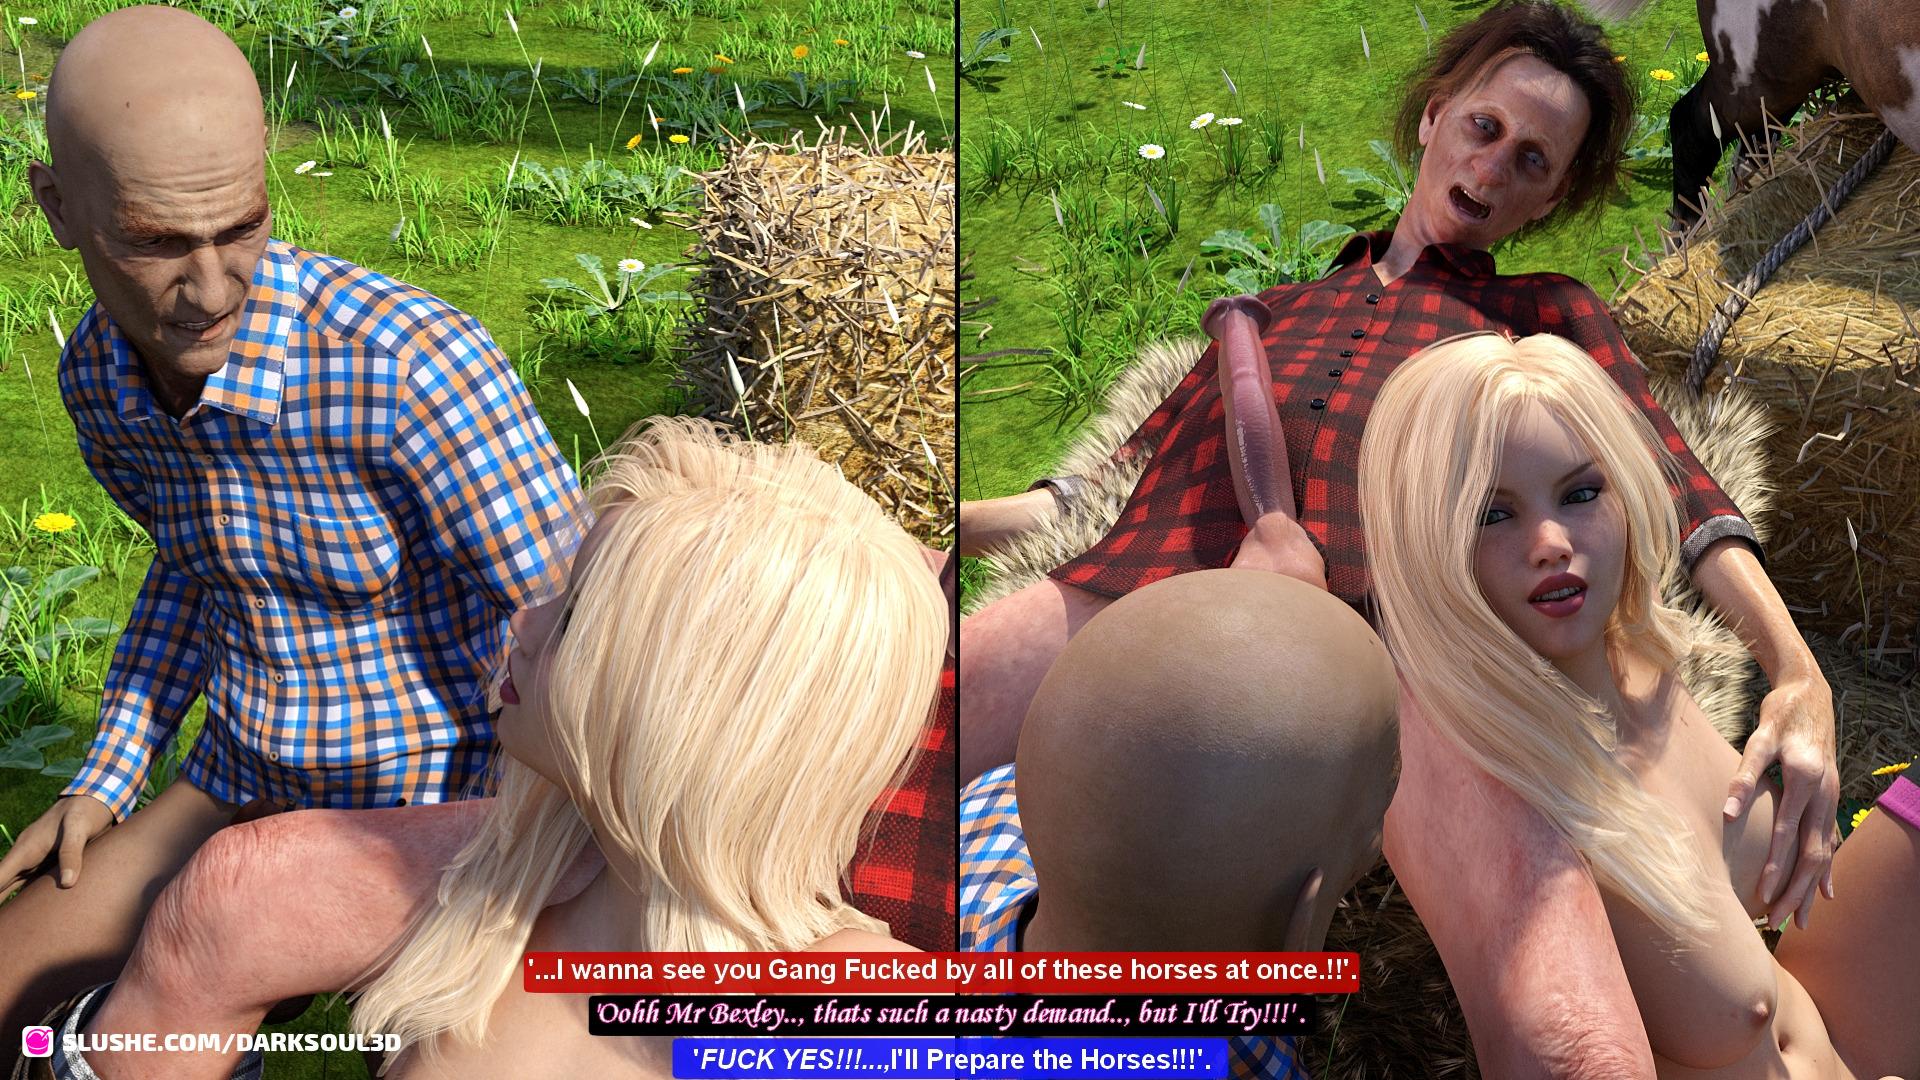 Rachaels Romps Episode 2. 'Farmer Jackson's Field'.